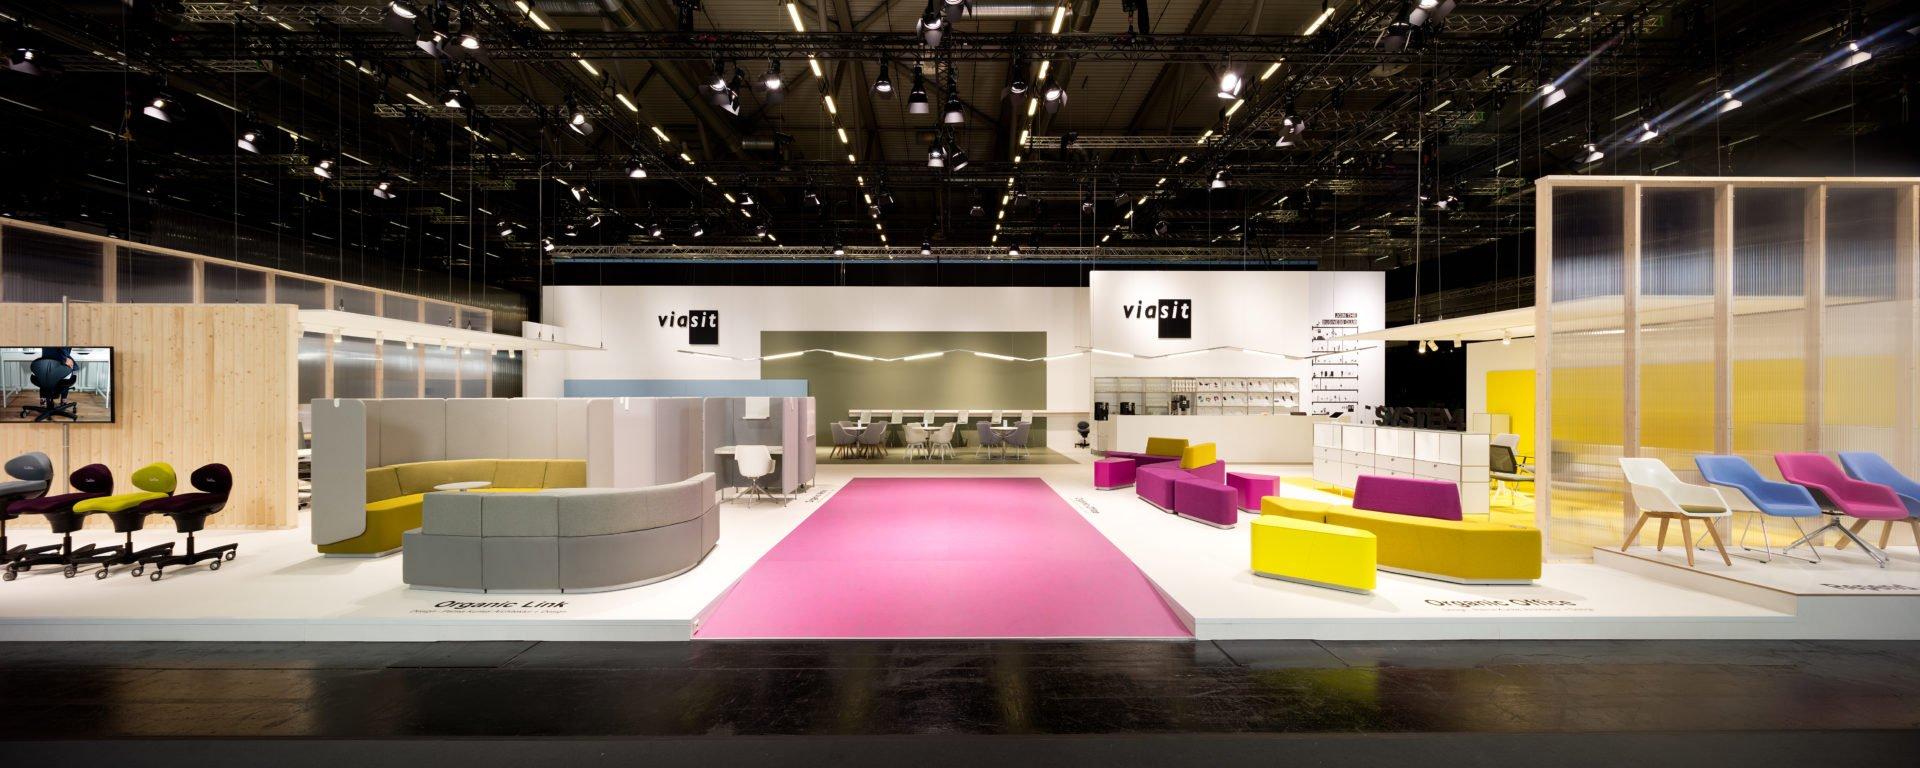 Messebau Koeln Orgatec 2018 Viasit Messedesign Messebauer Front Rl